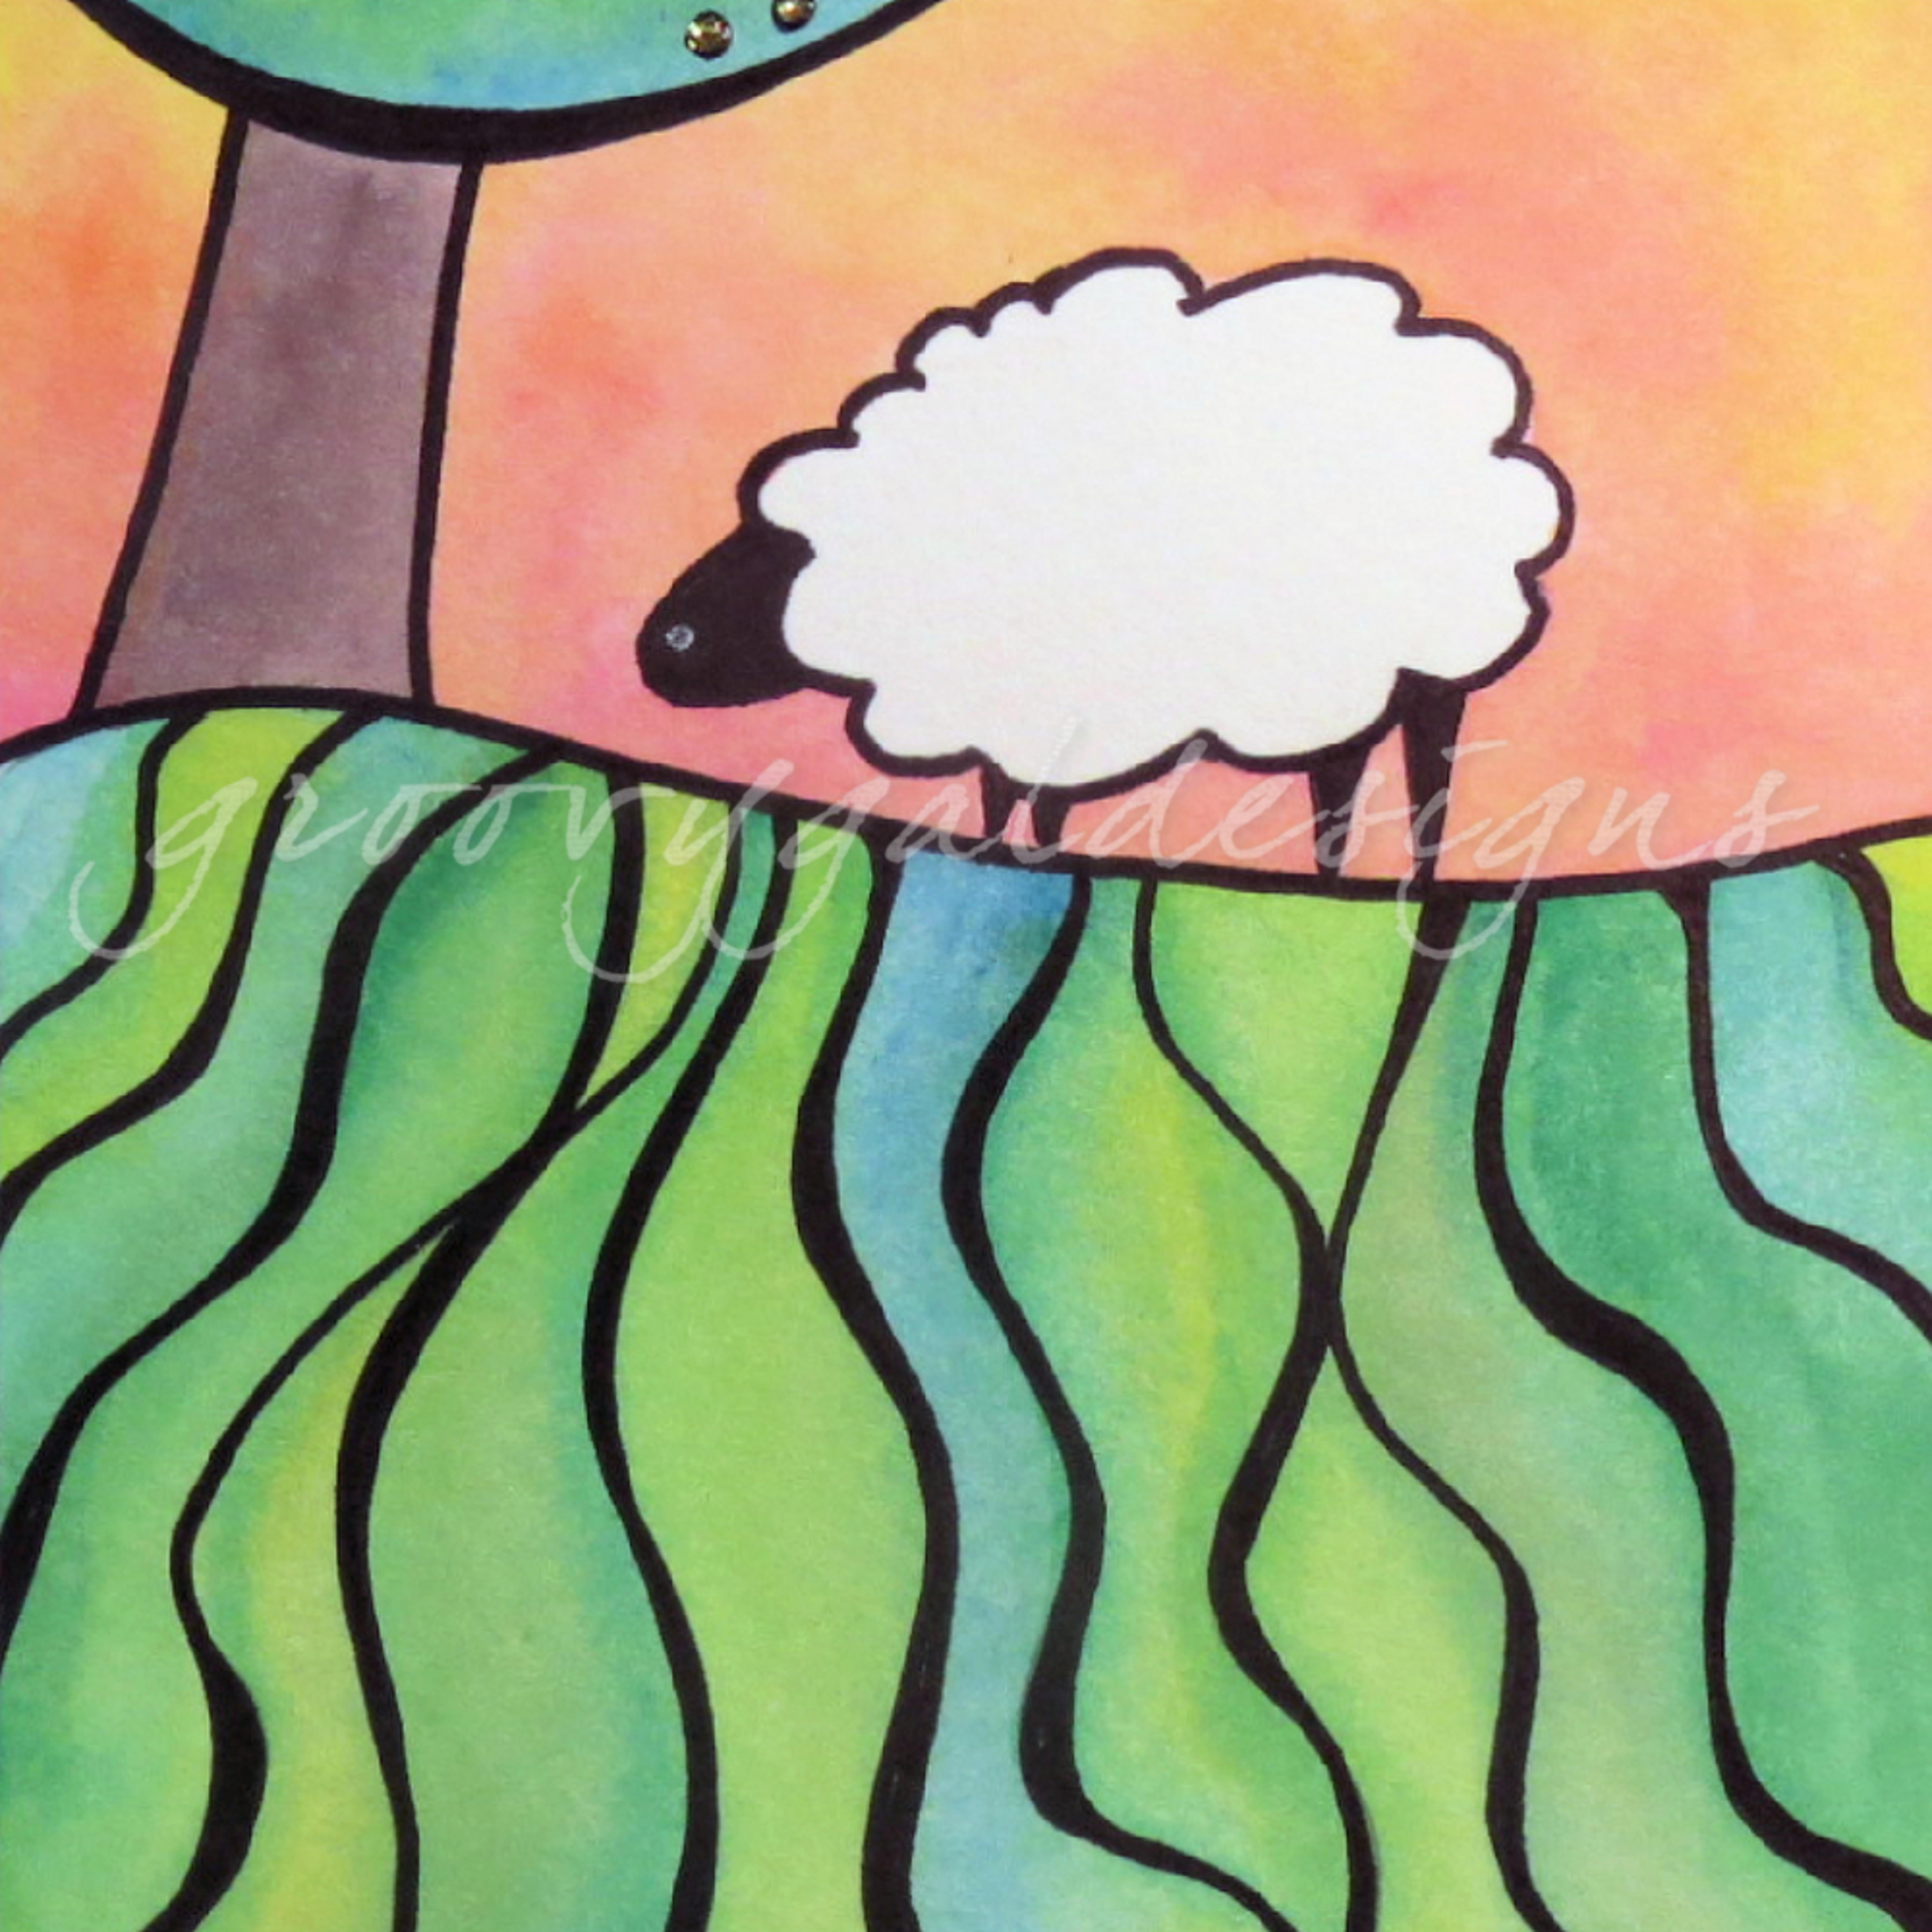 Sheep on a hill 4 puz7wf